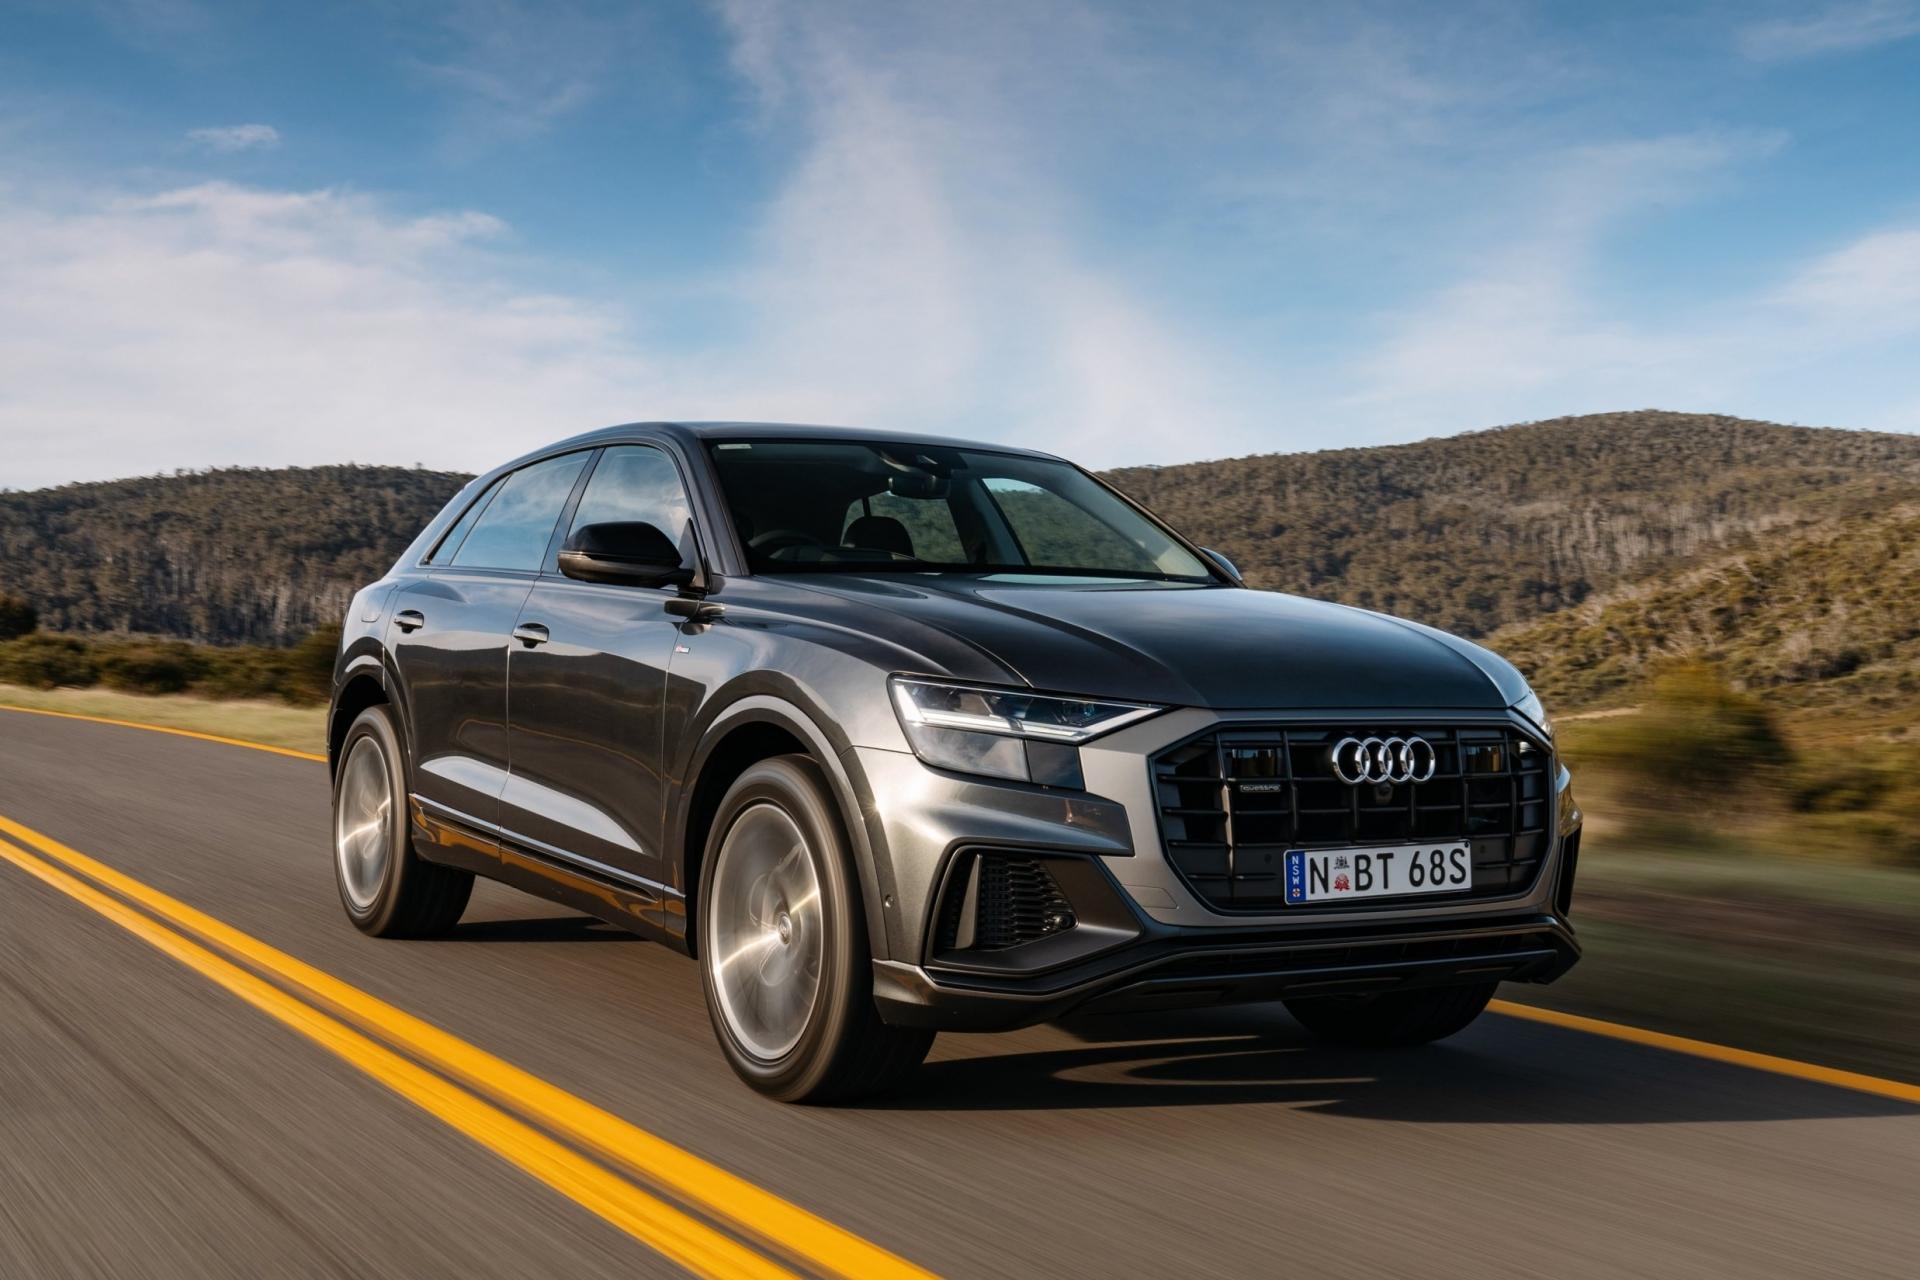 Audi Q8 цены отзывы характеристики Q8 от Audi